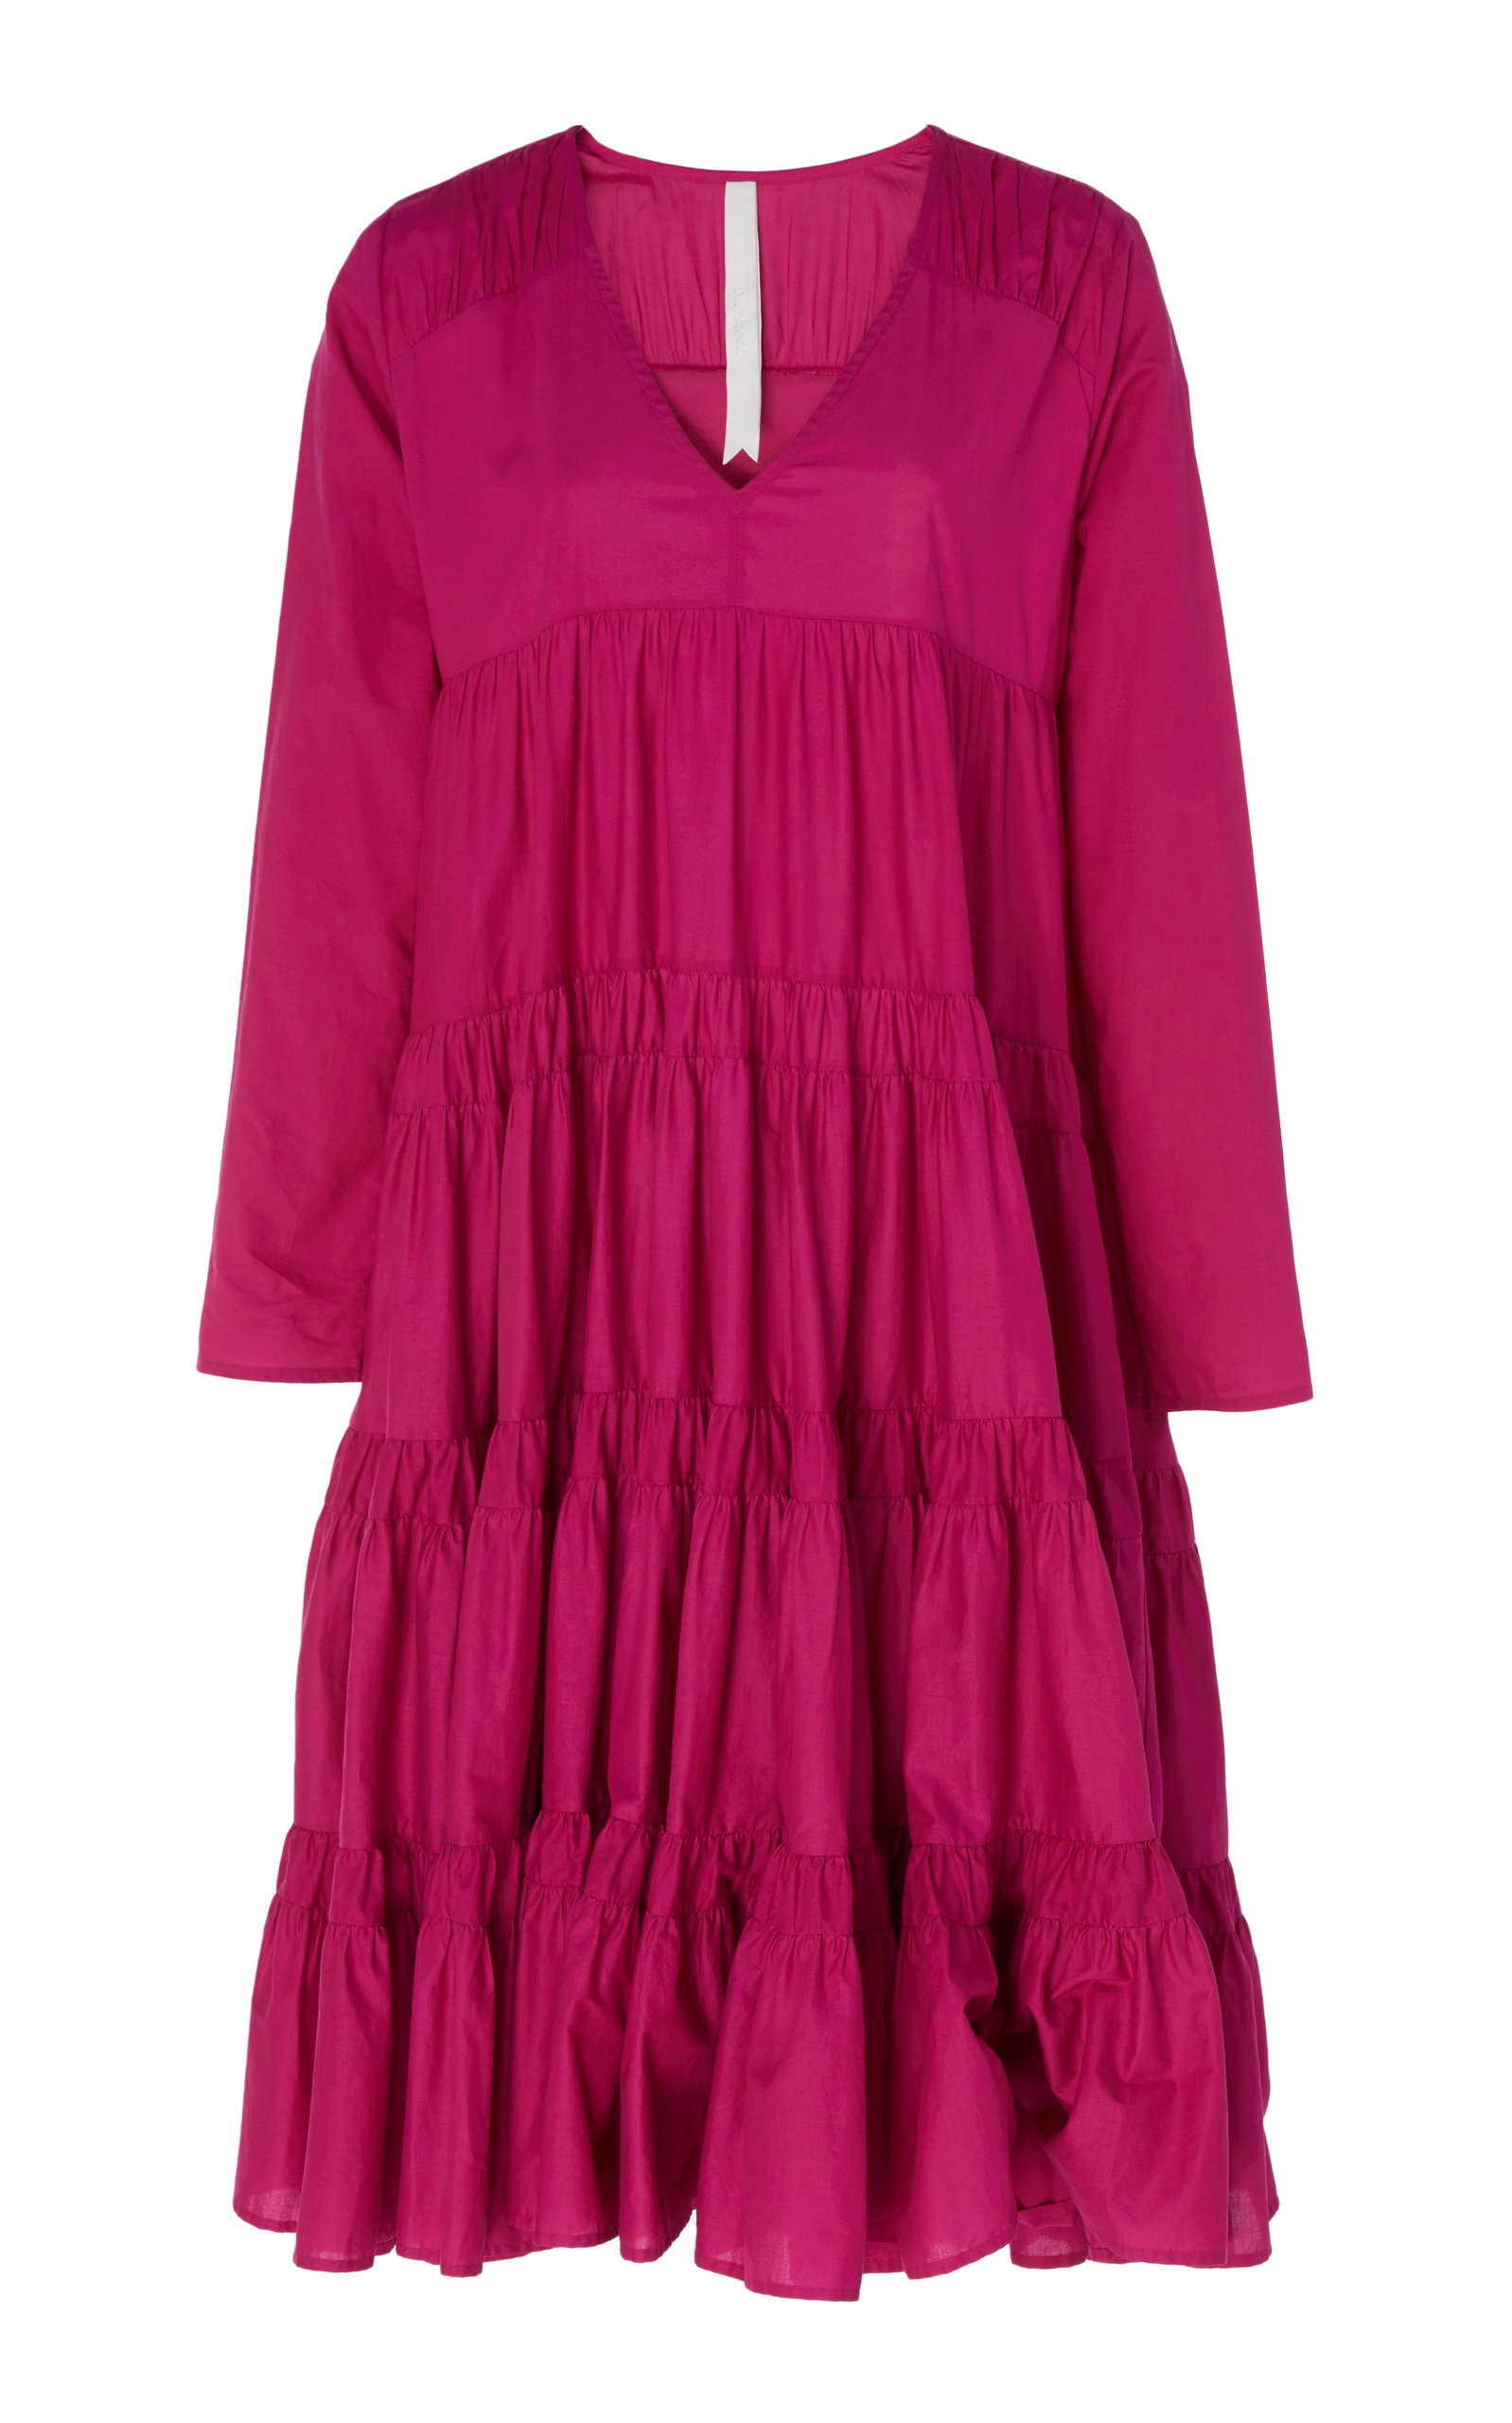 12513724fe4c81 Rodas Tiered Ruche Dress by Merlette   Moda Operandi